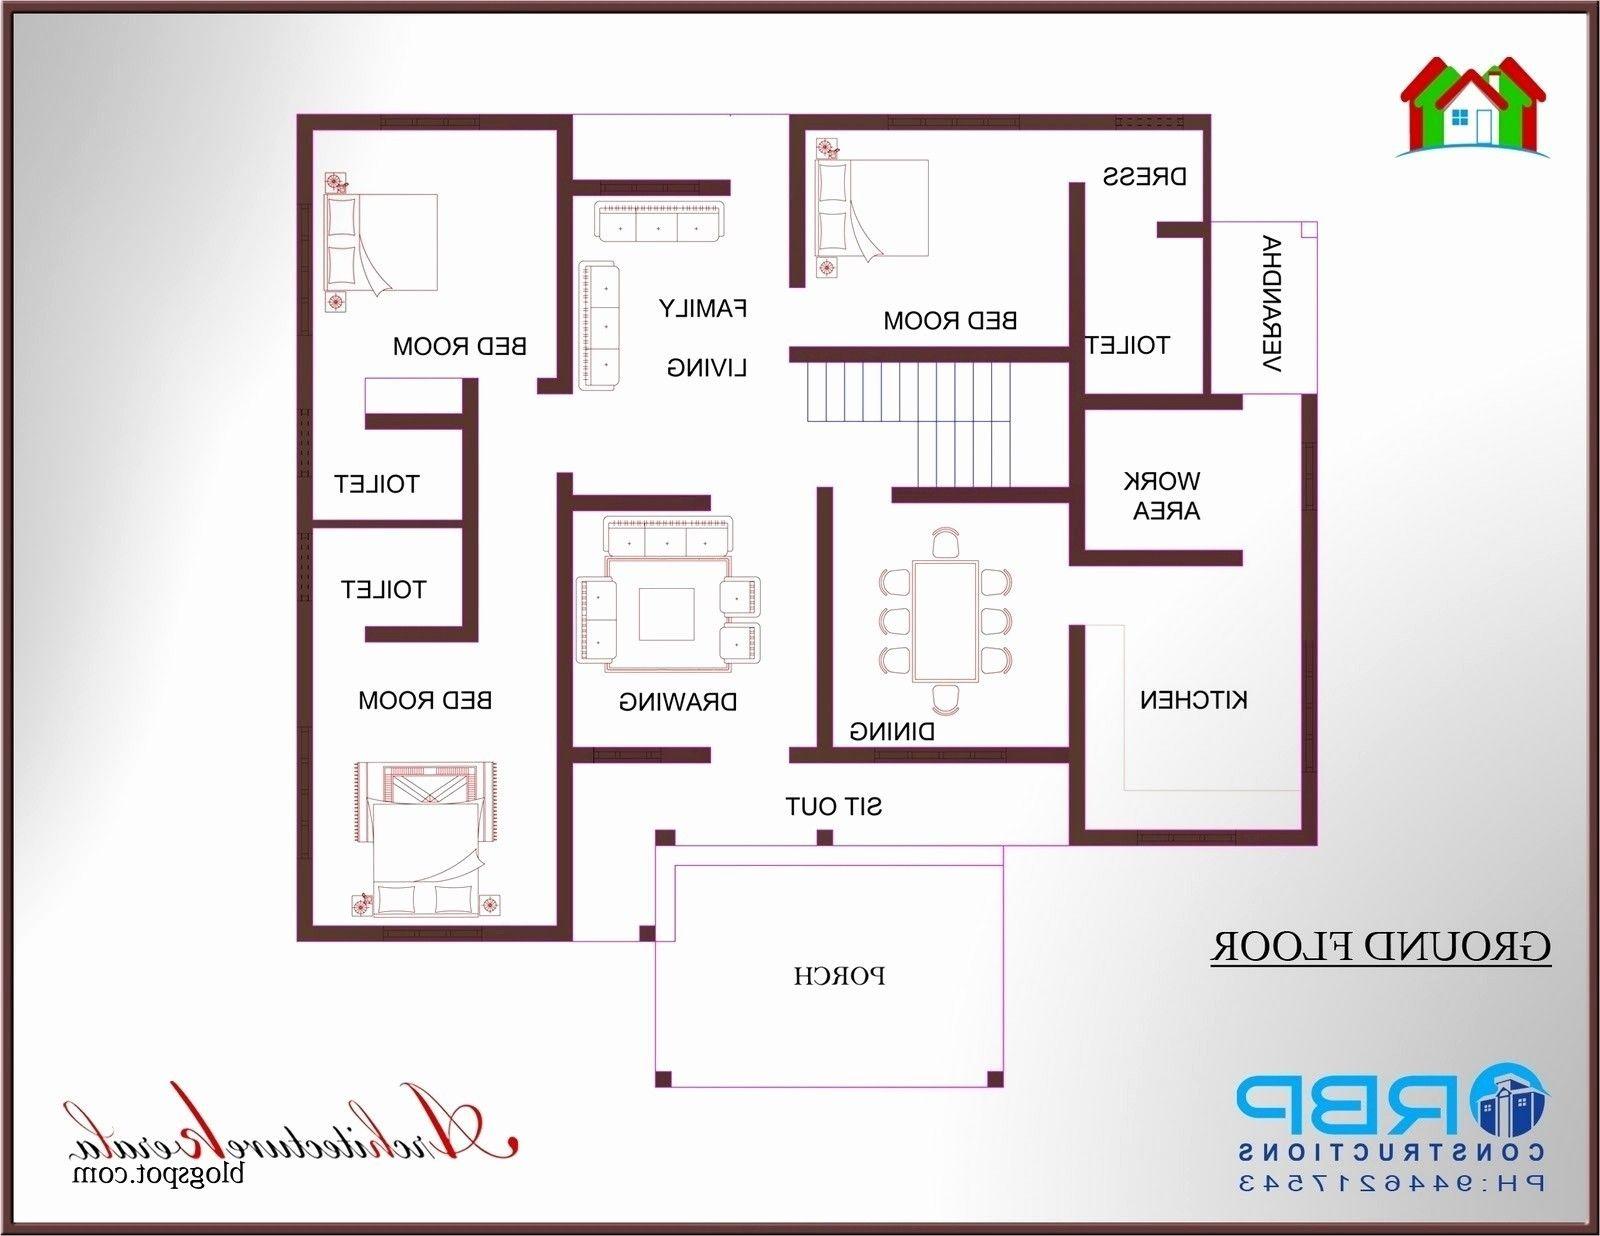 22 Beautiful 1200 Sq Ft House Plans 2 Bedroom Bedroom House Plans House Plans With Photos 1200 Sq Ft House